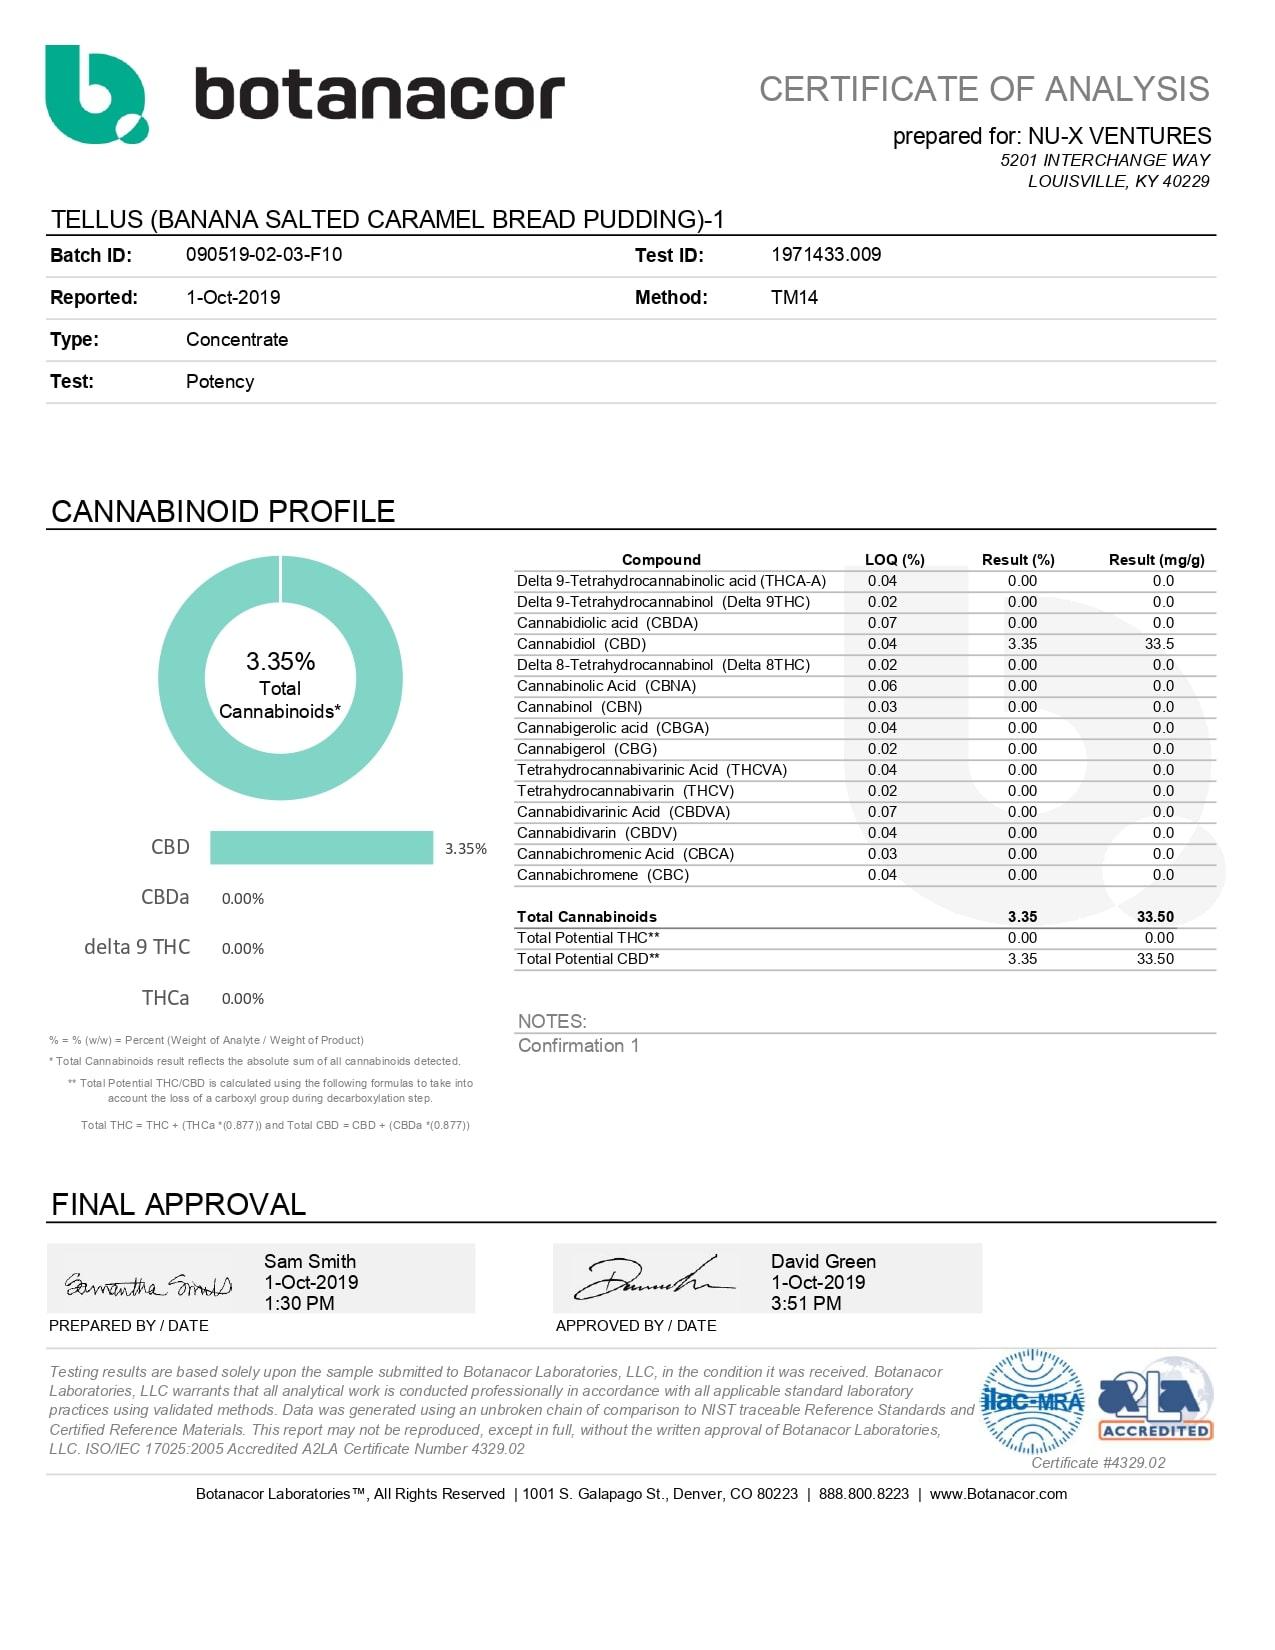 NU-X CBD eLiquid Banana Caramel - Tellus Lab Report 1000mg